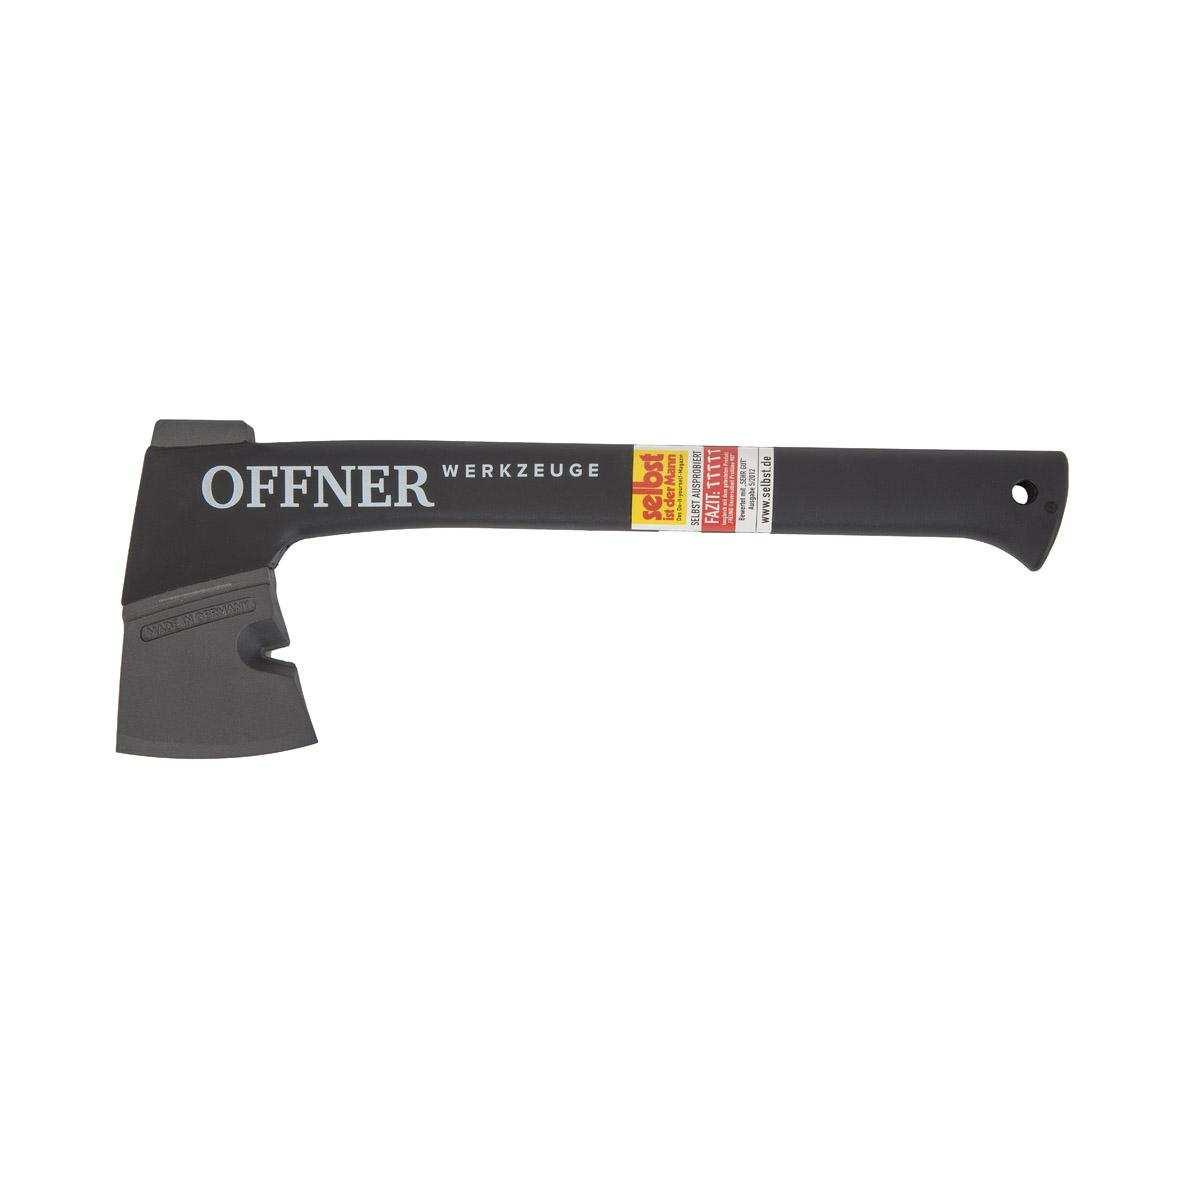 Offner 907 Üniversal Parçalama Baltası